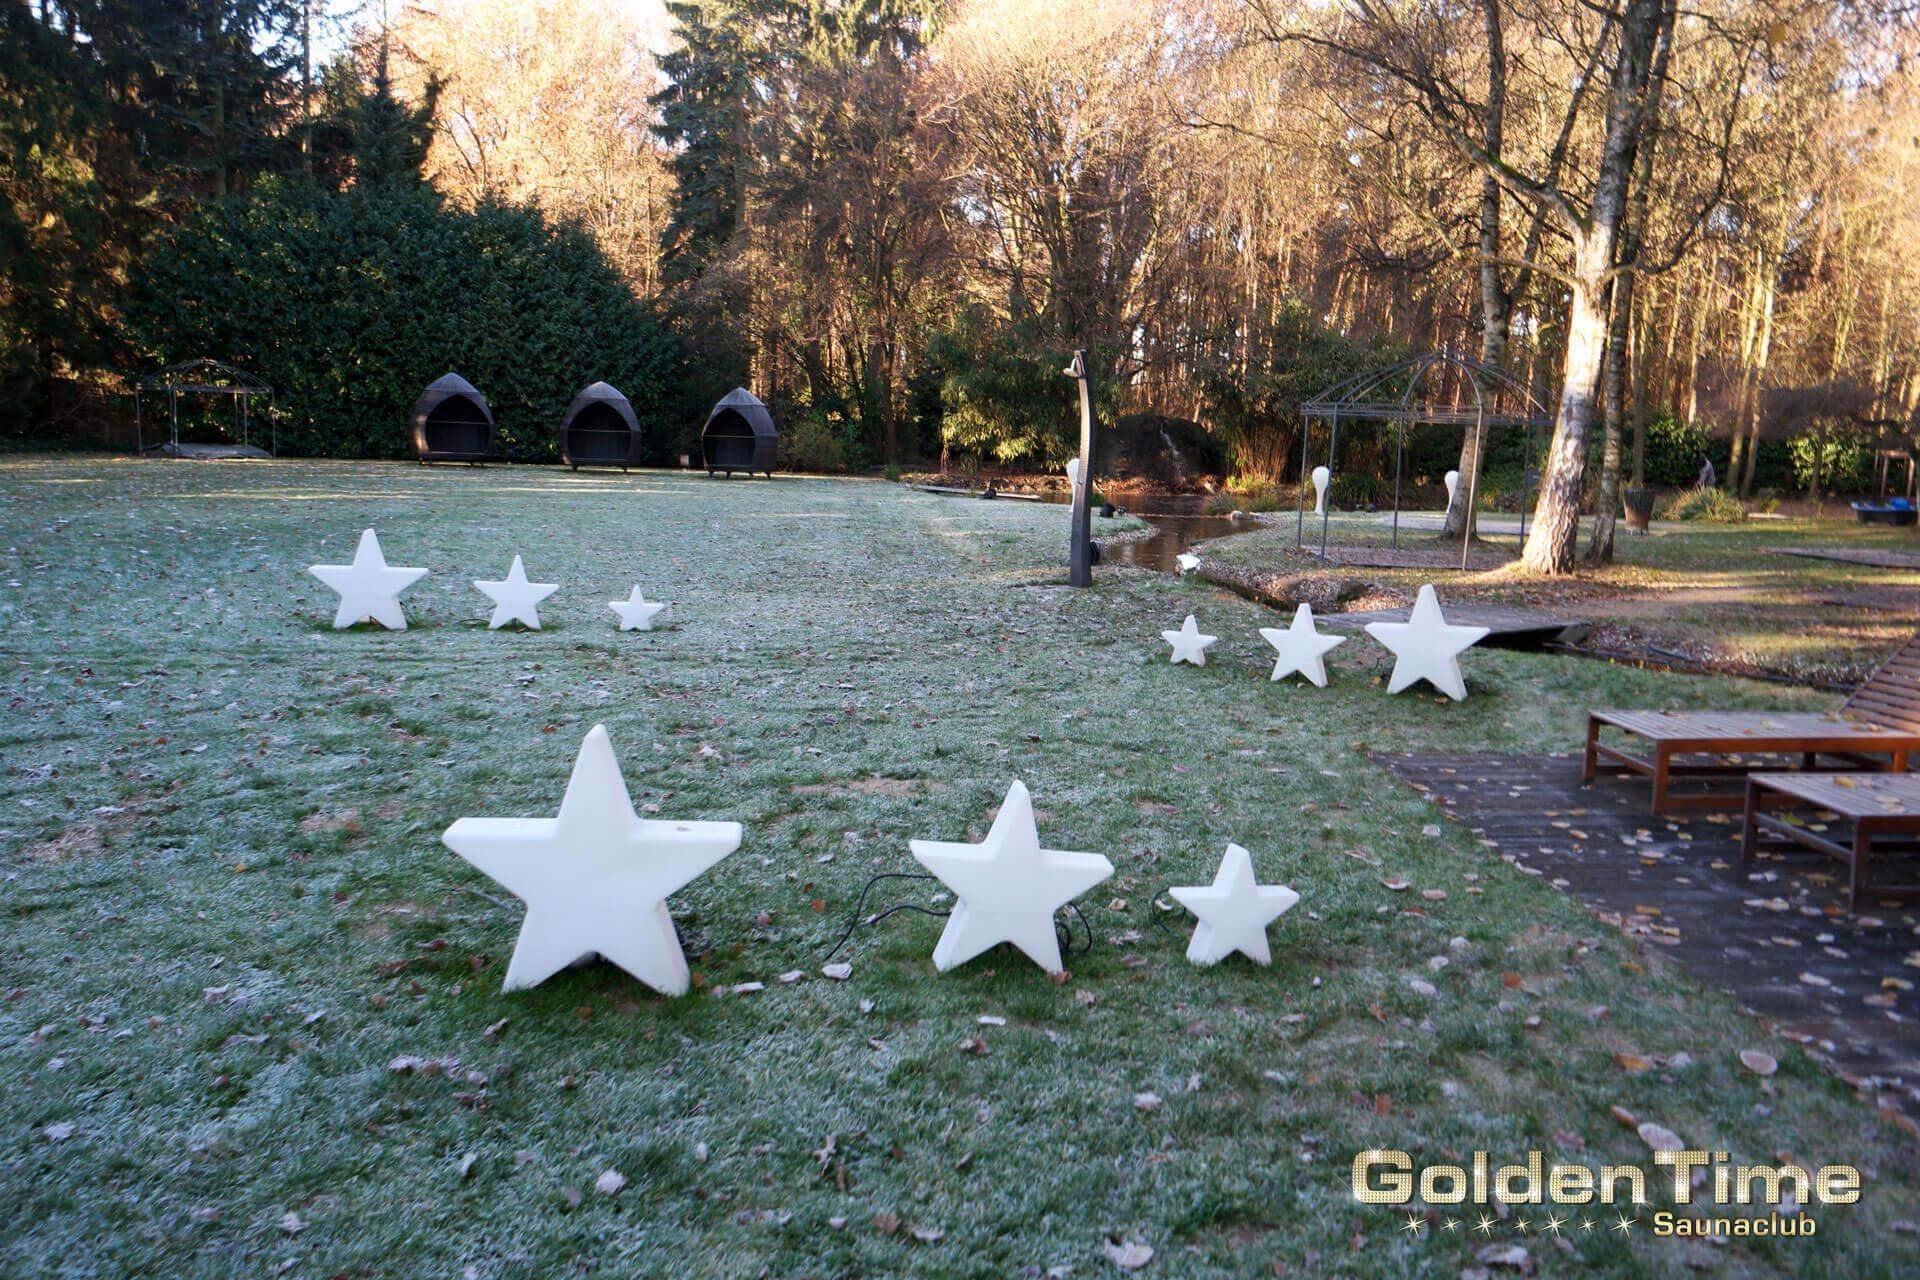 03-fkk-saunaclub-goldentime-xmas-13.jpg